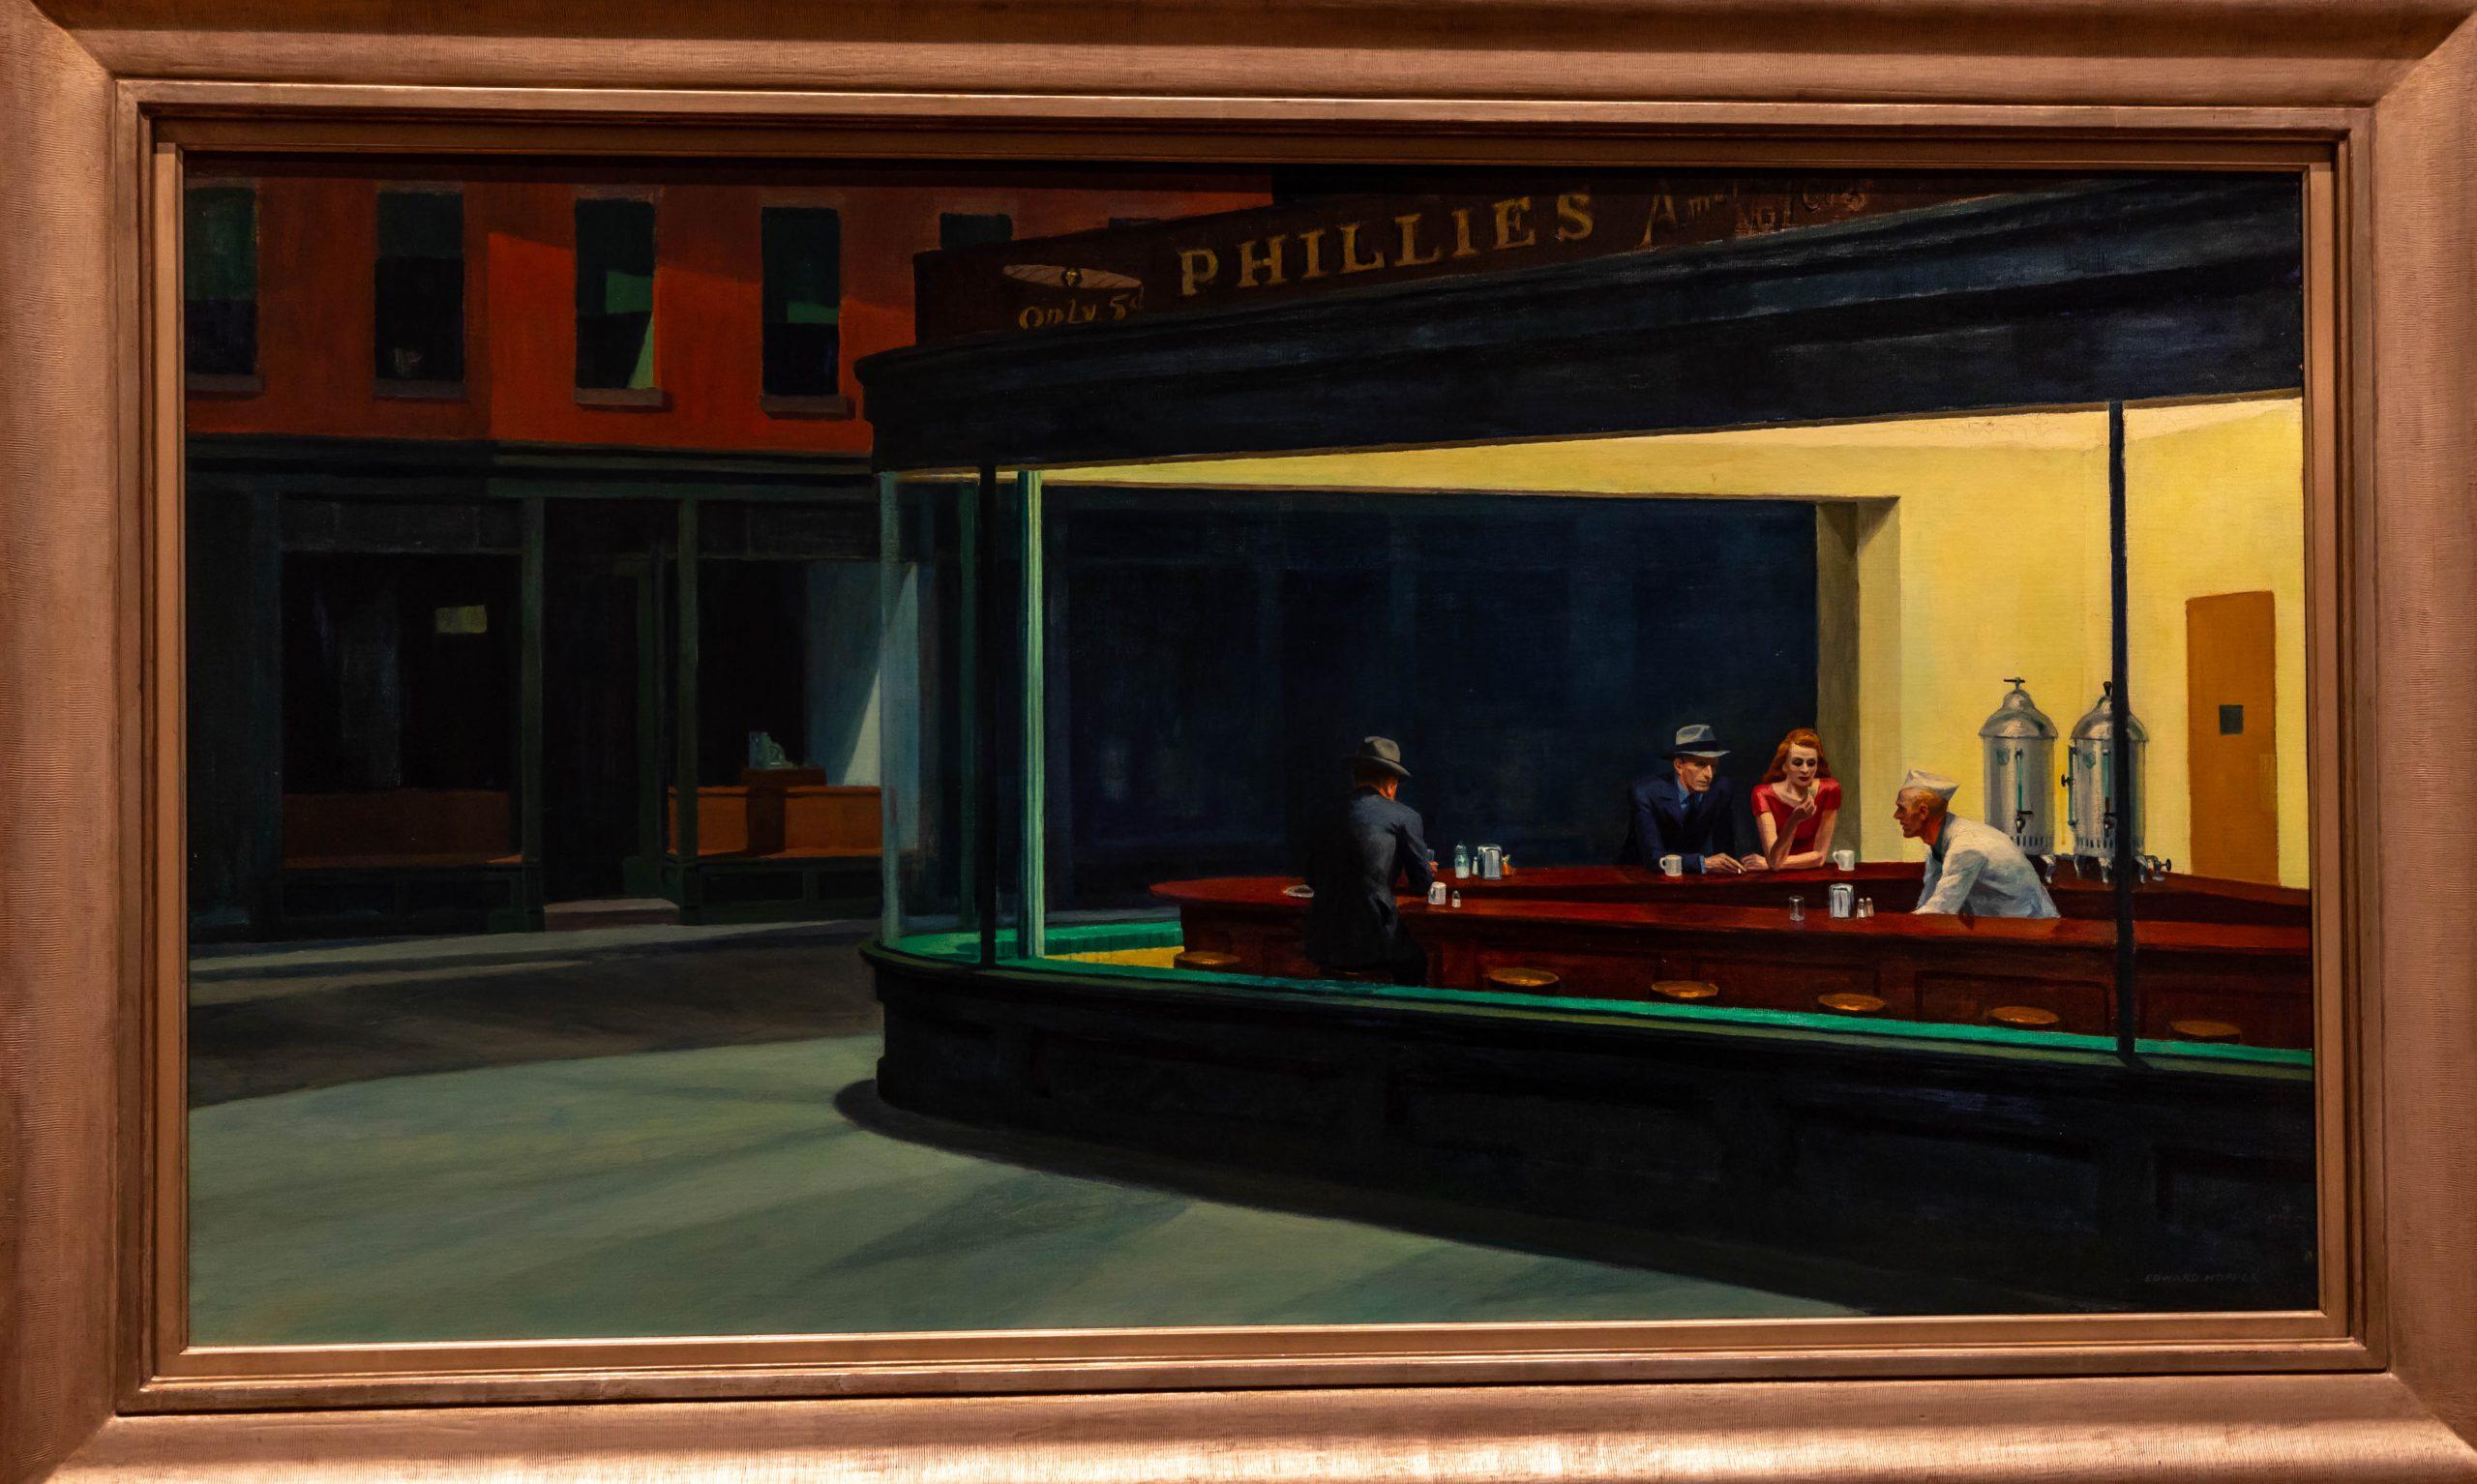 Nighthawks The Art Institute of Chicago in Chicago, Illinois by Annie Fairfax